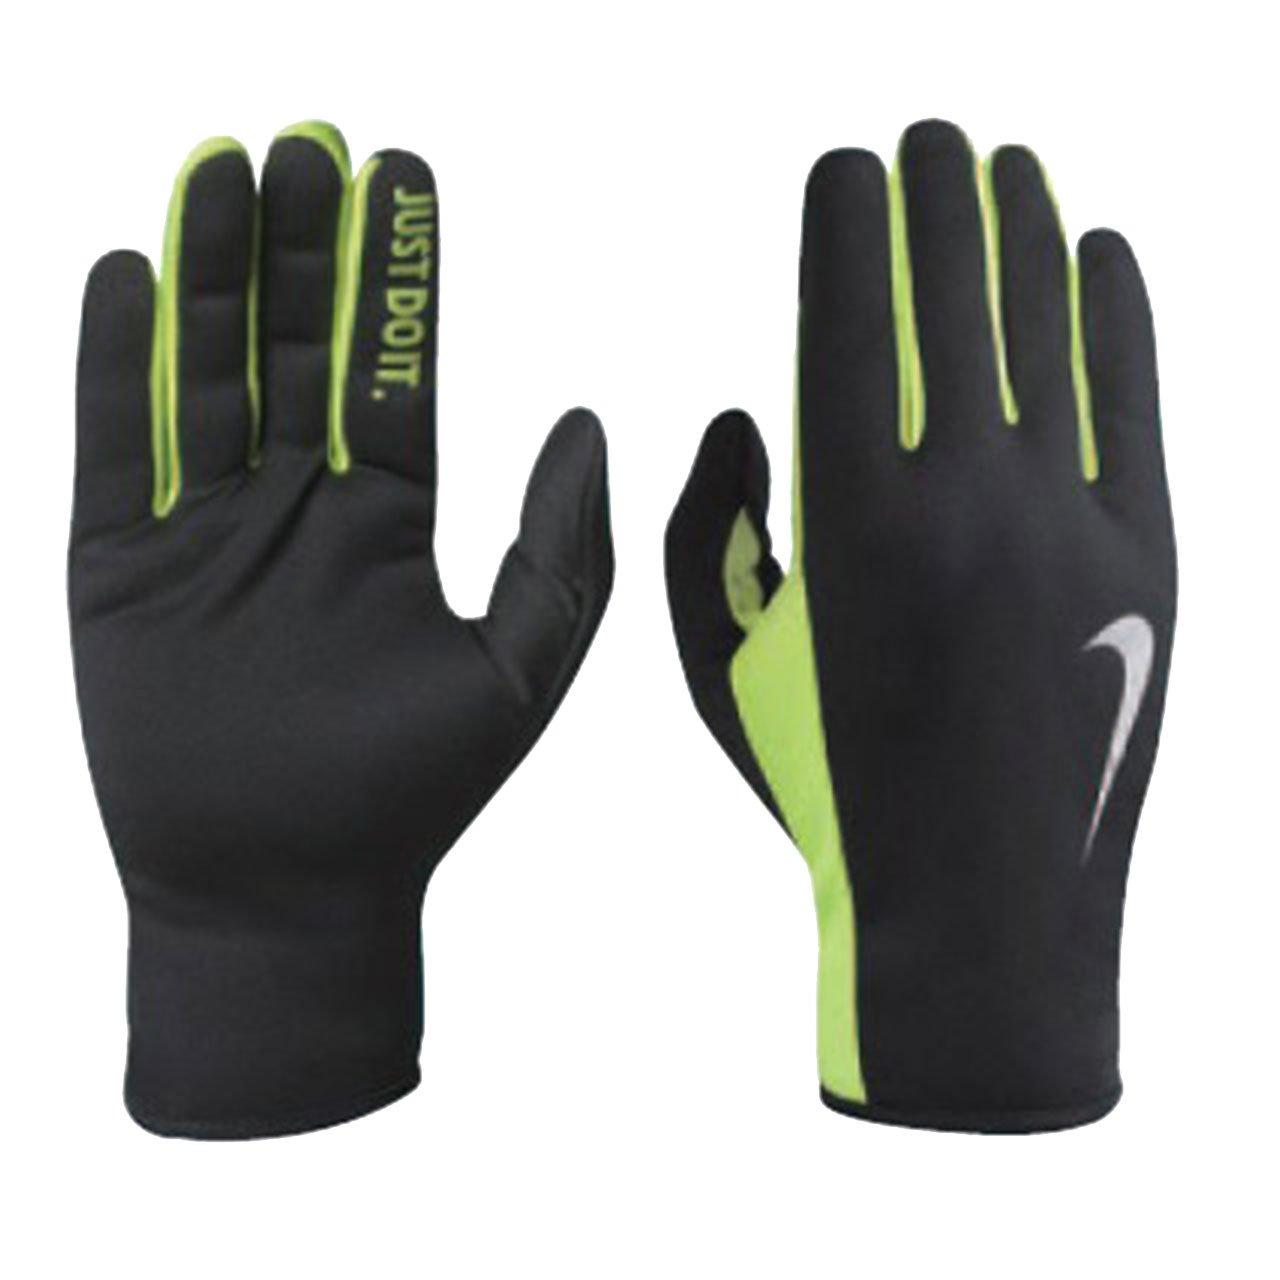 Mens Rally Run Gloves 2.0 - Black/Volt Nike